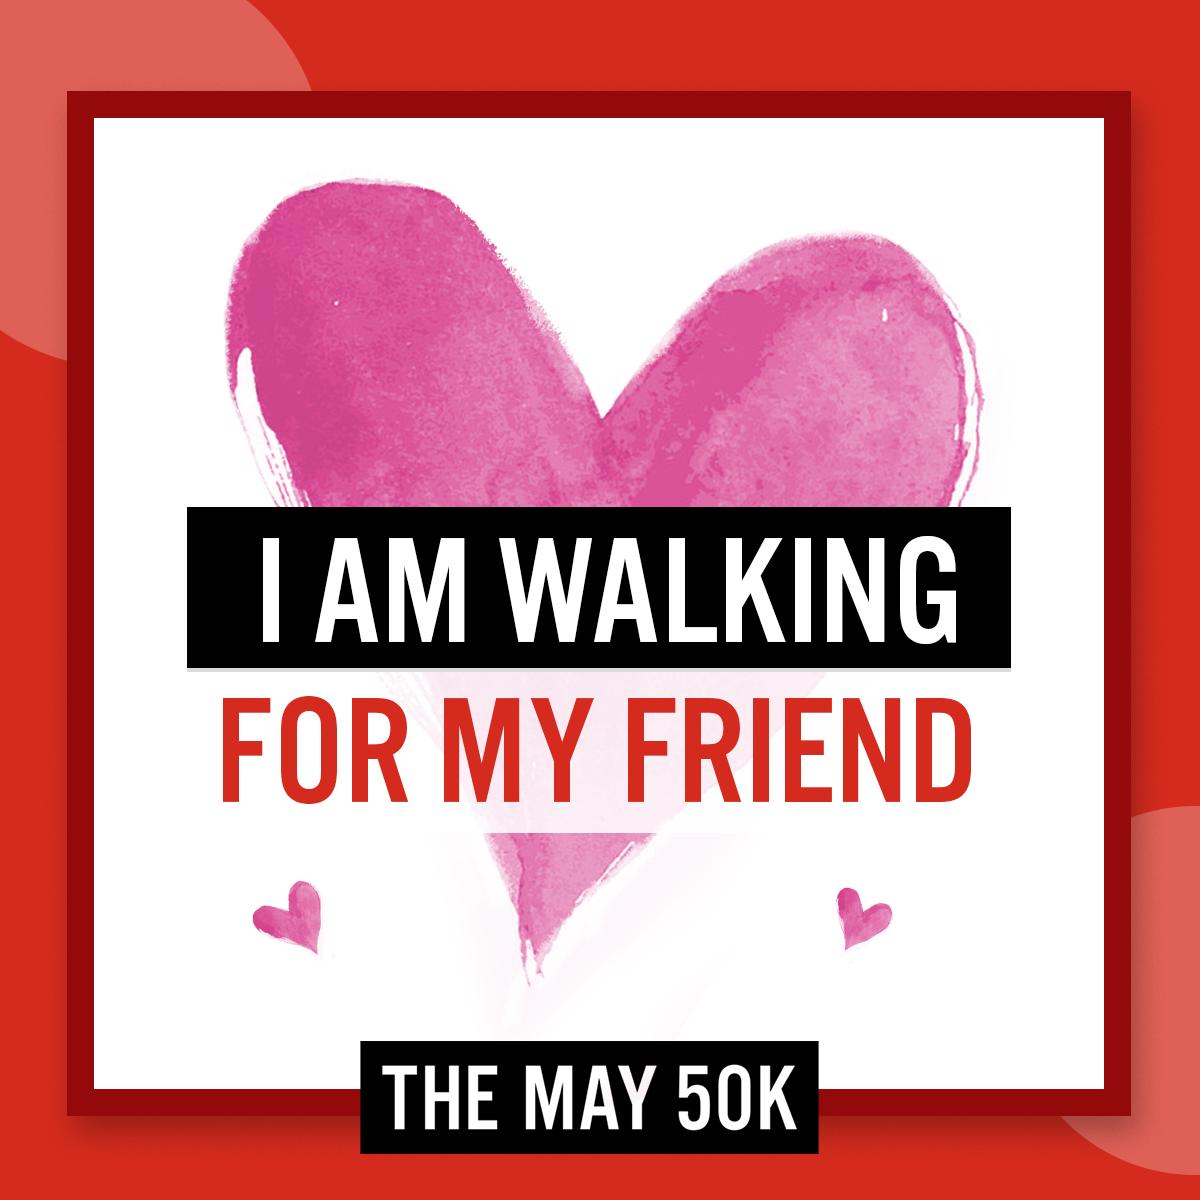 Social Posts - Walk For Friend